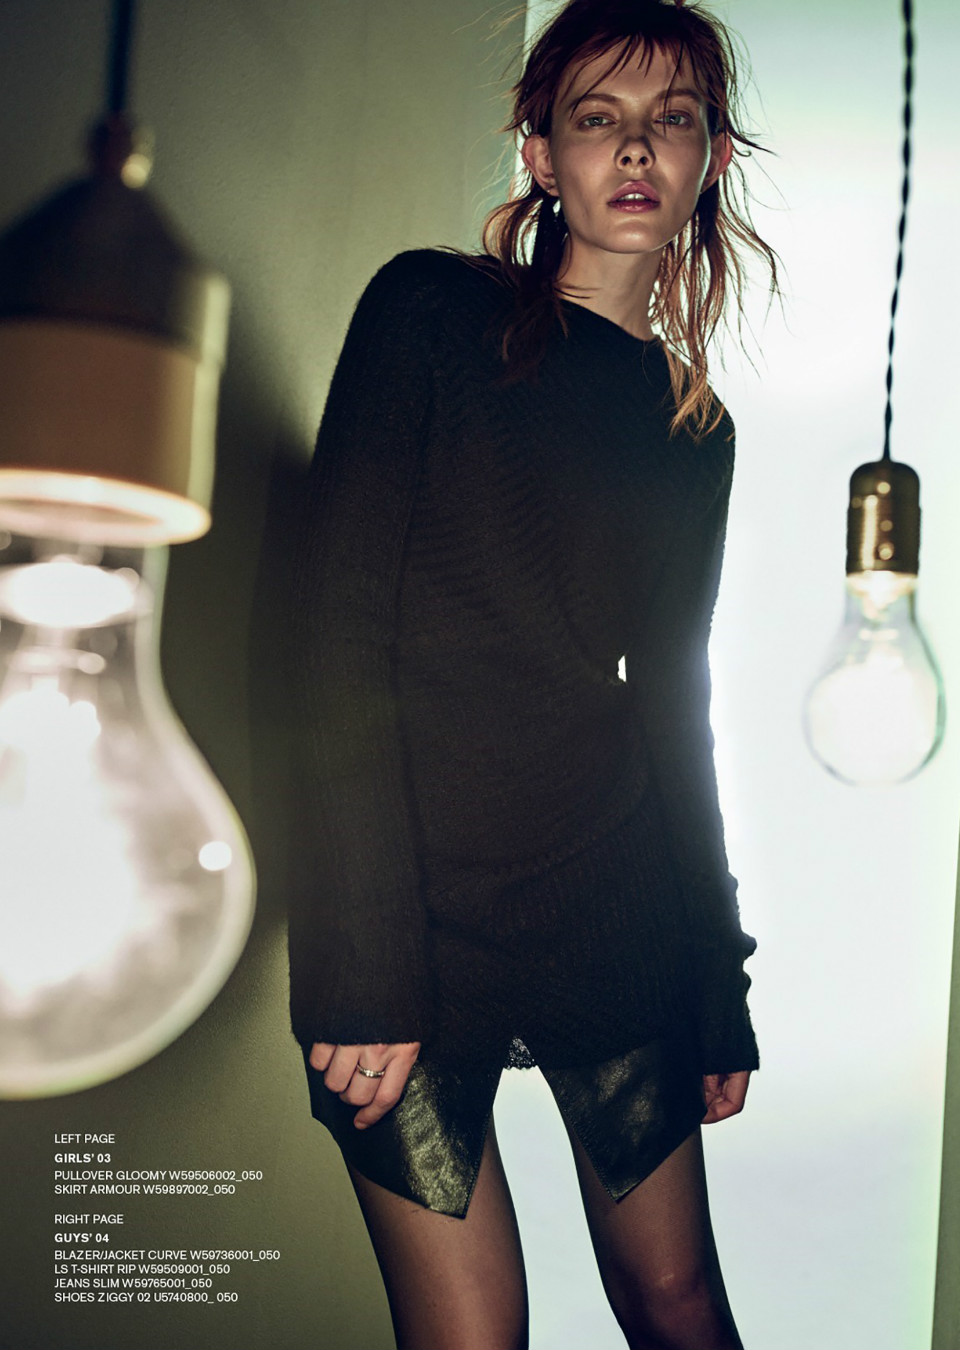 Sabi - a model from Austria | Model Management